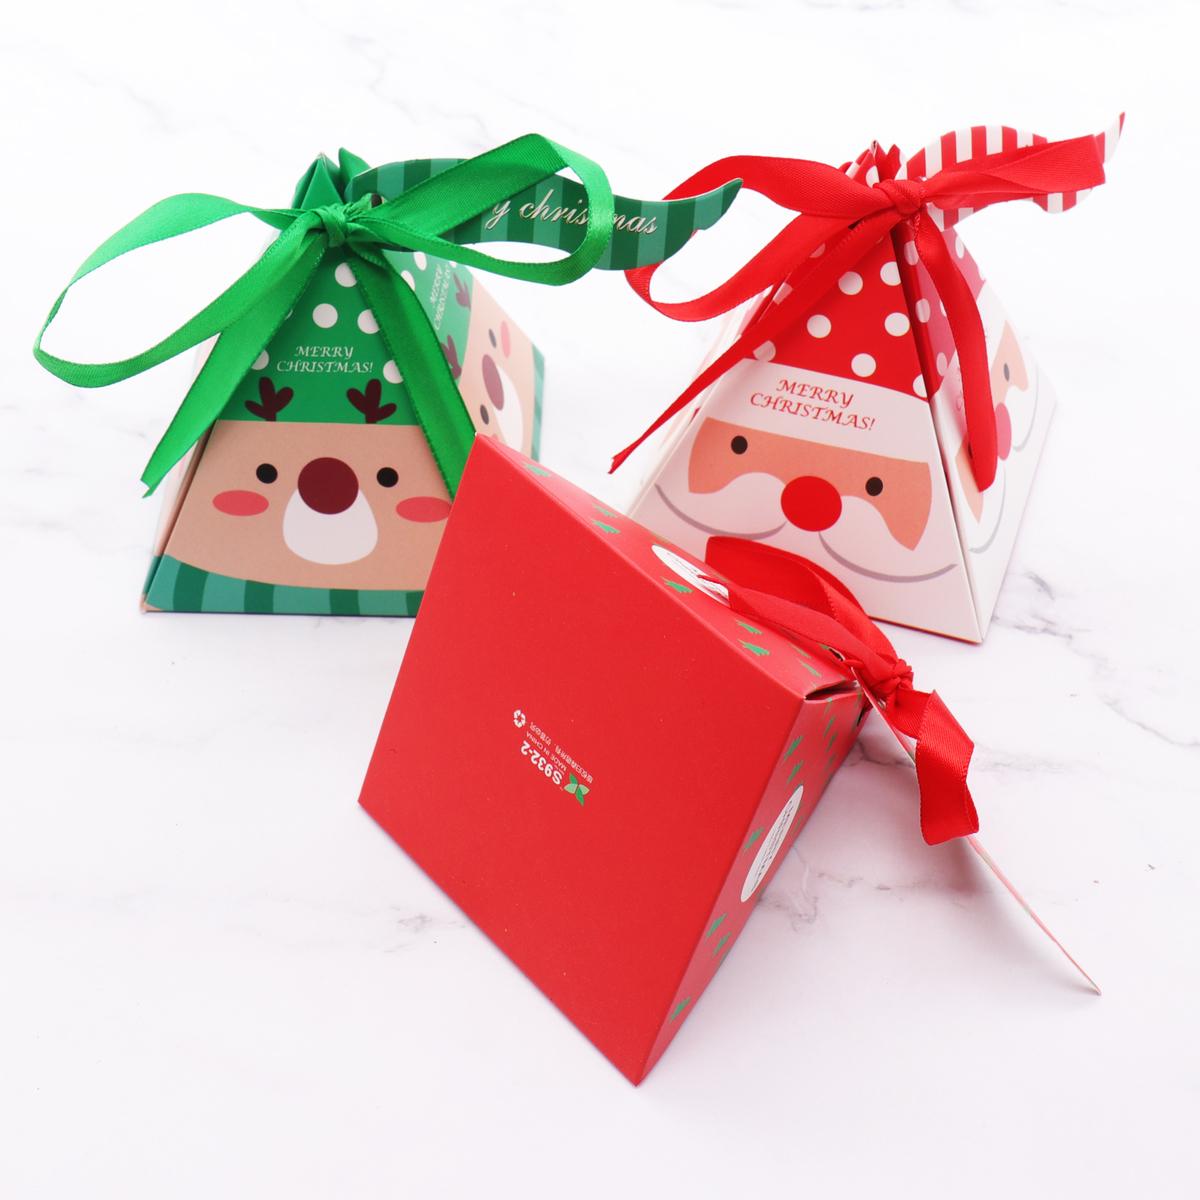 7.5x7.5x9.5cm Merry Christmas Candy Box Bag Christmas Tree paper Santa Claus gift box pyramid party chocolate box C18112701